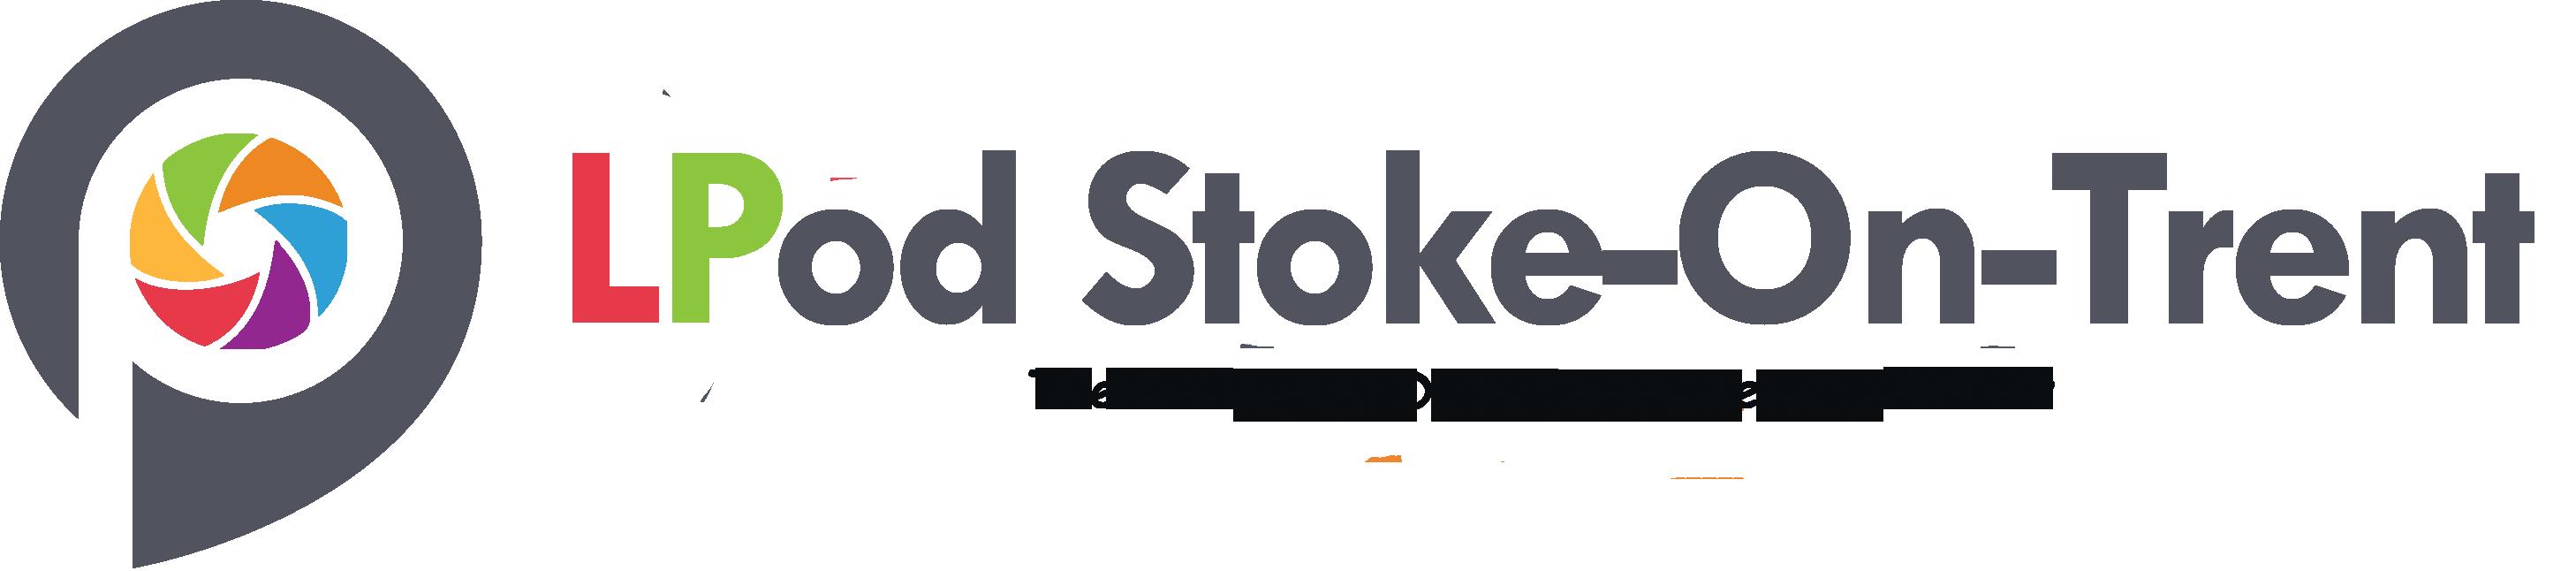 intensive driving courses stoke-on-trent, intensive driving lessons stoke-on-trent, intensive driving school stoke on trent